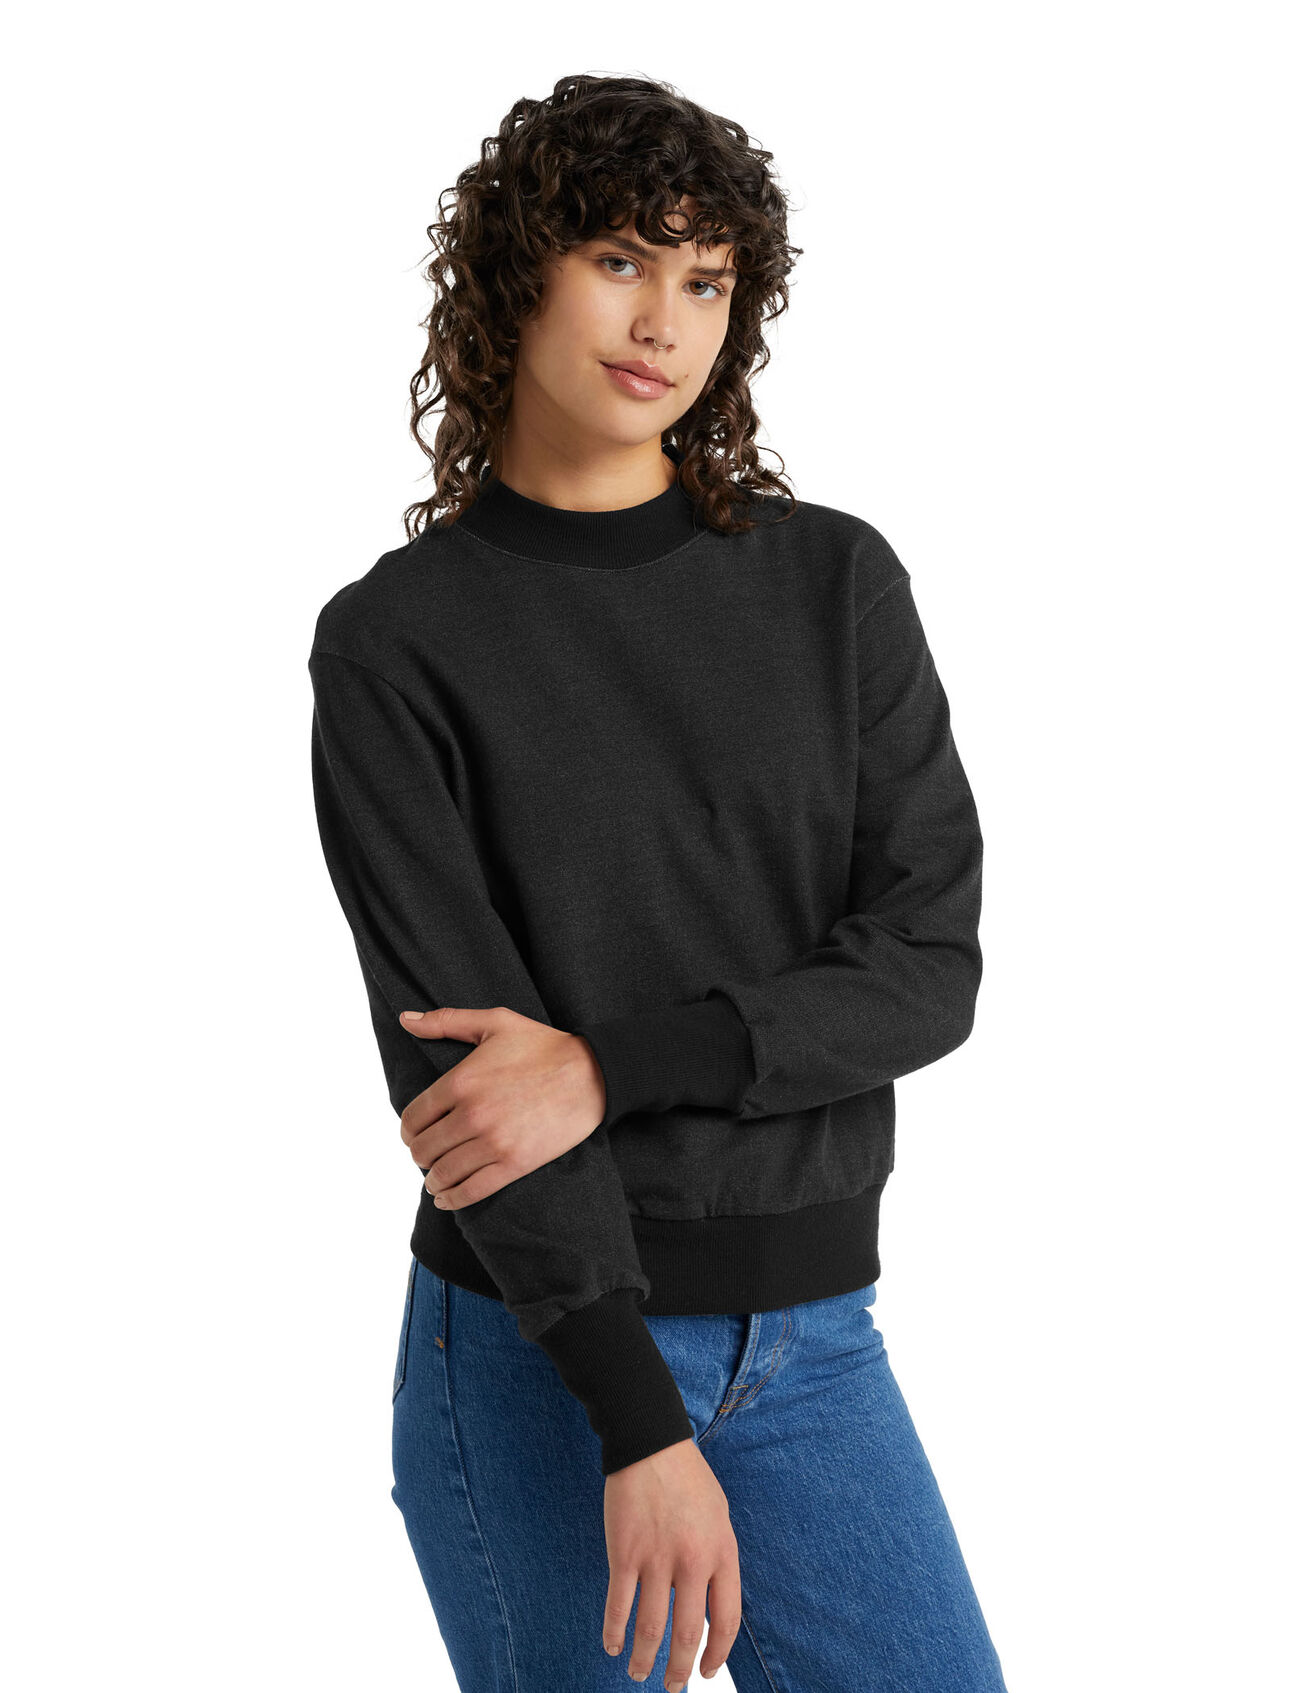 Merino Central Long Sleeve Sweatshirt